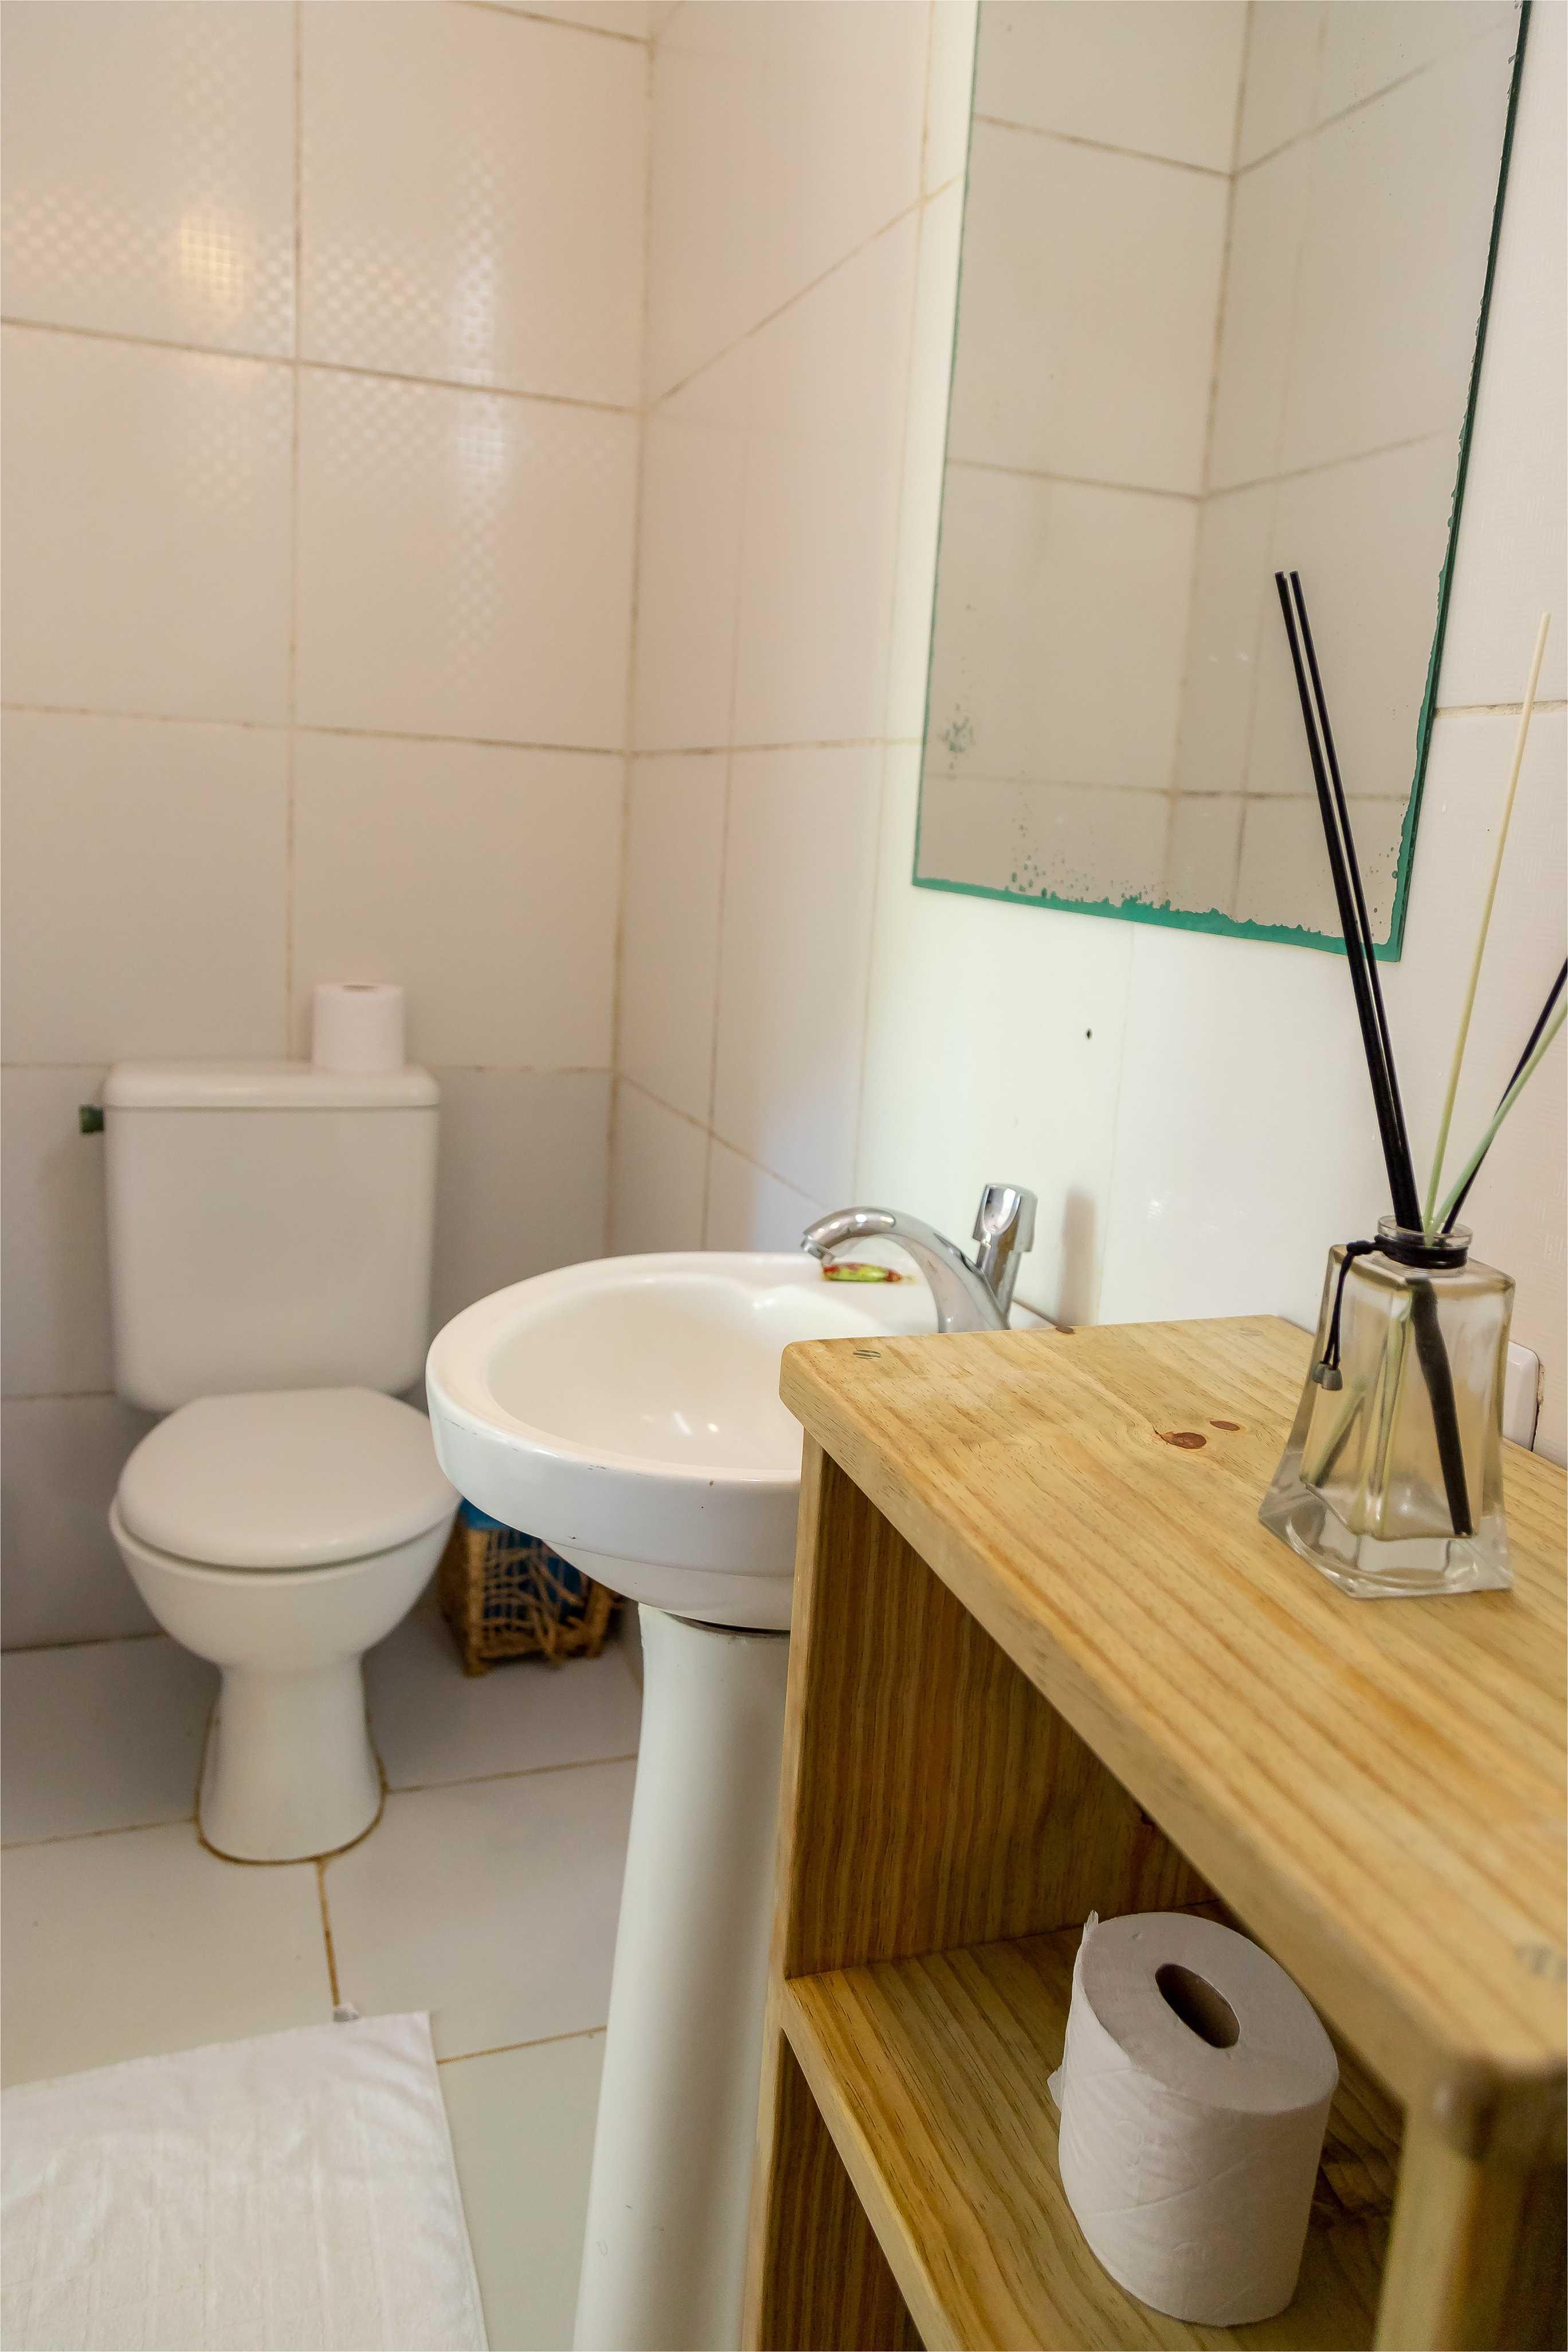 Bathroom suite 06